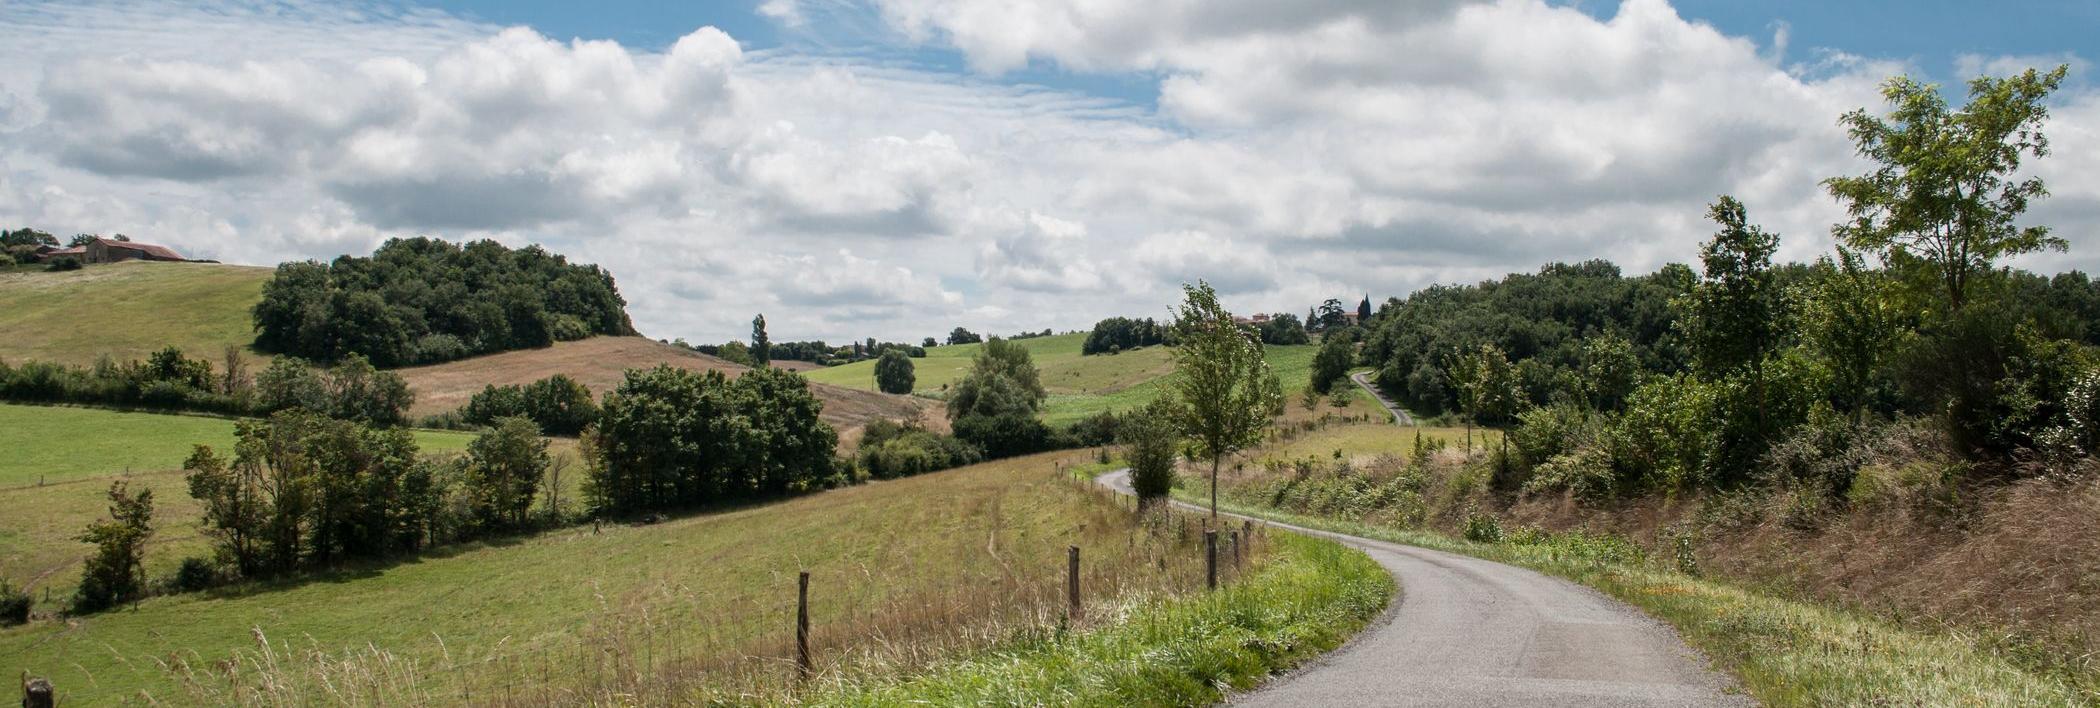 vanilla-countryside-fields-road